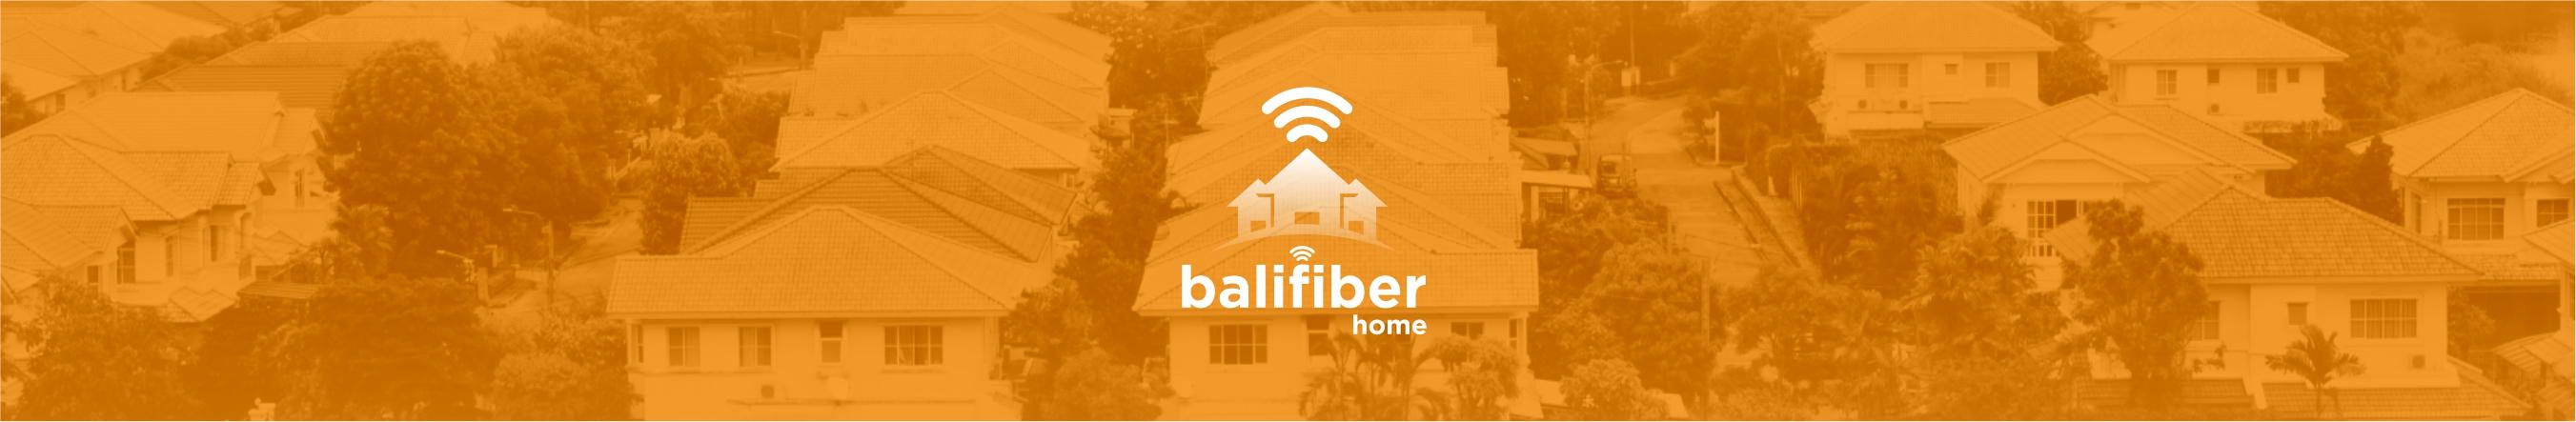 [DISKUSI] Bali Fiber by PT Bali Towerindo Sentra, Tbk